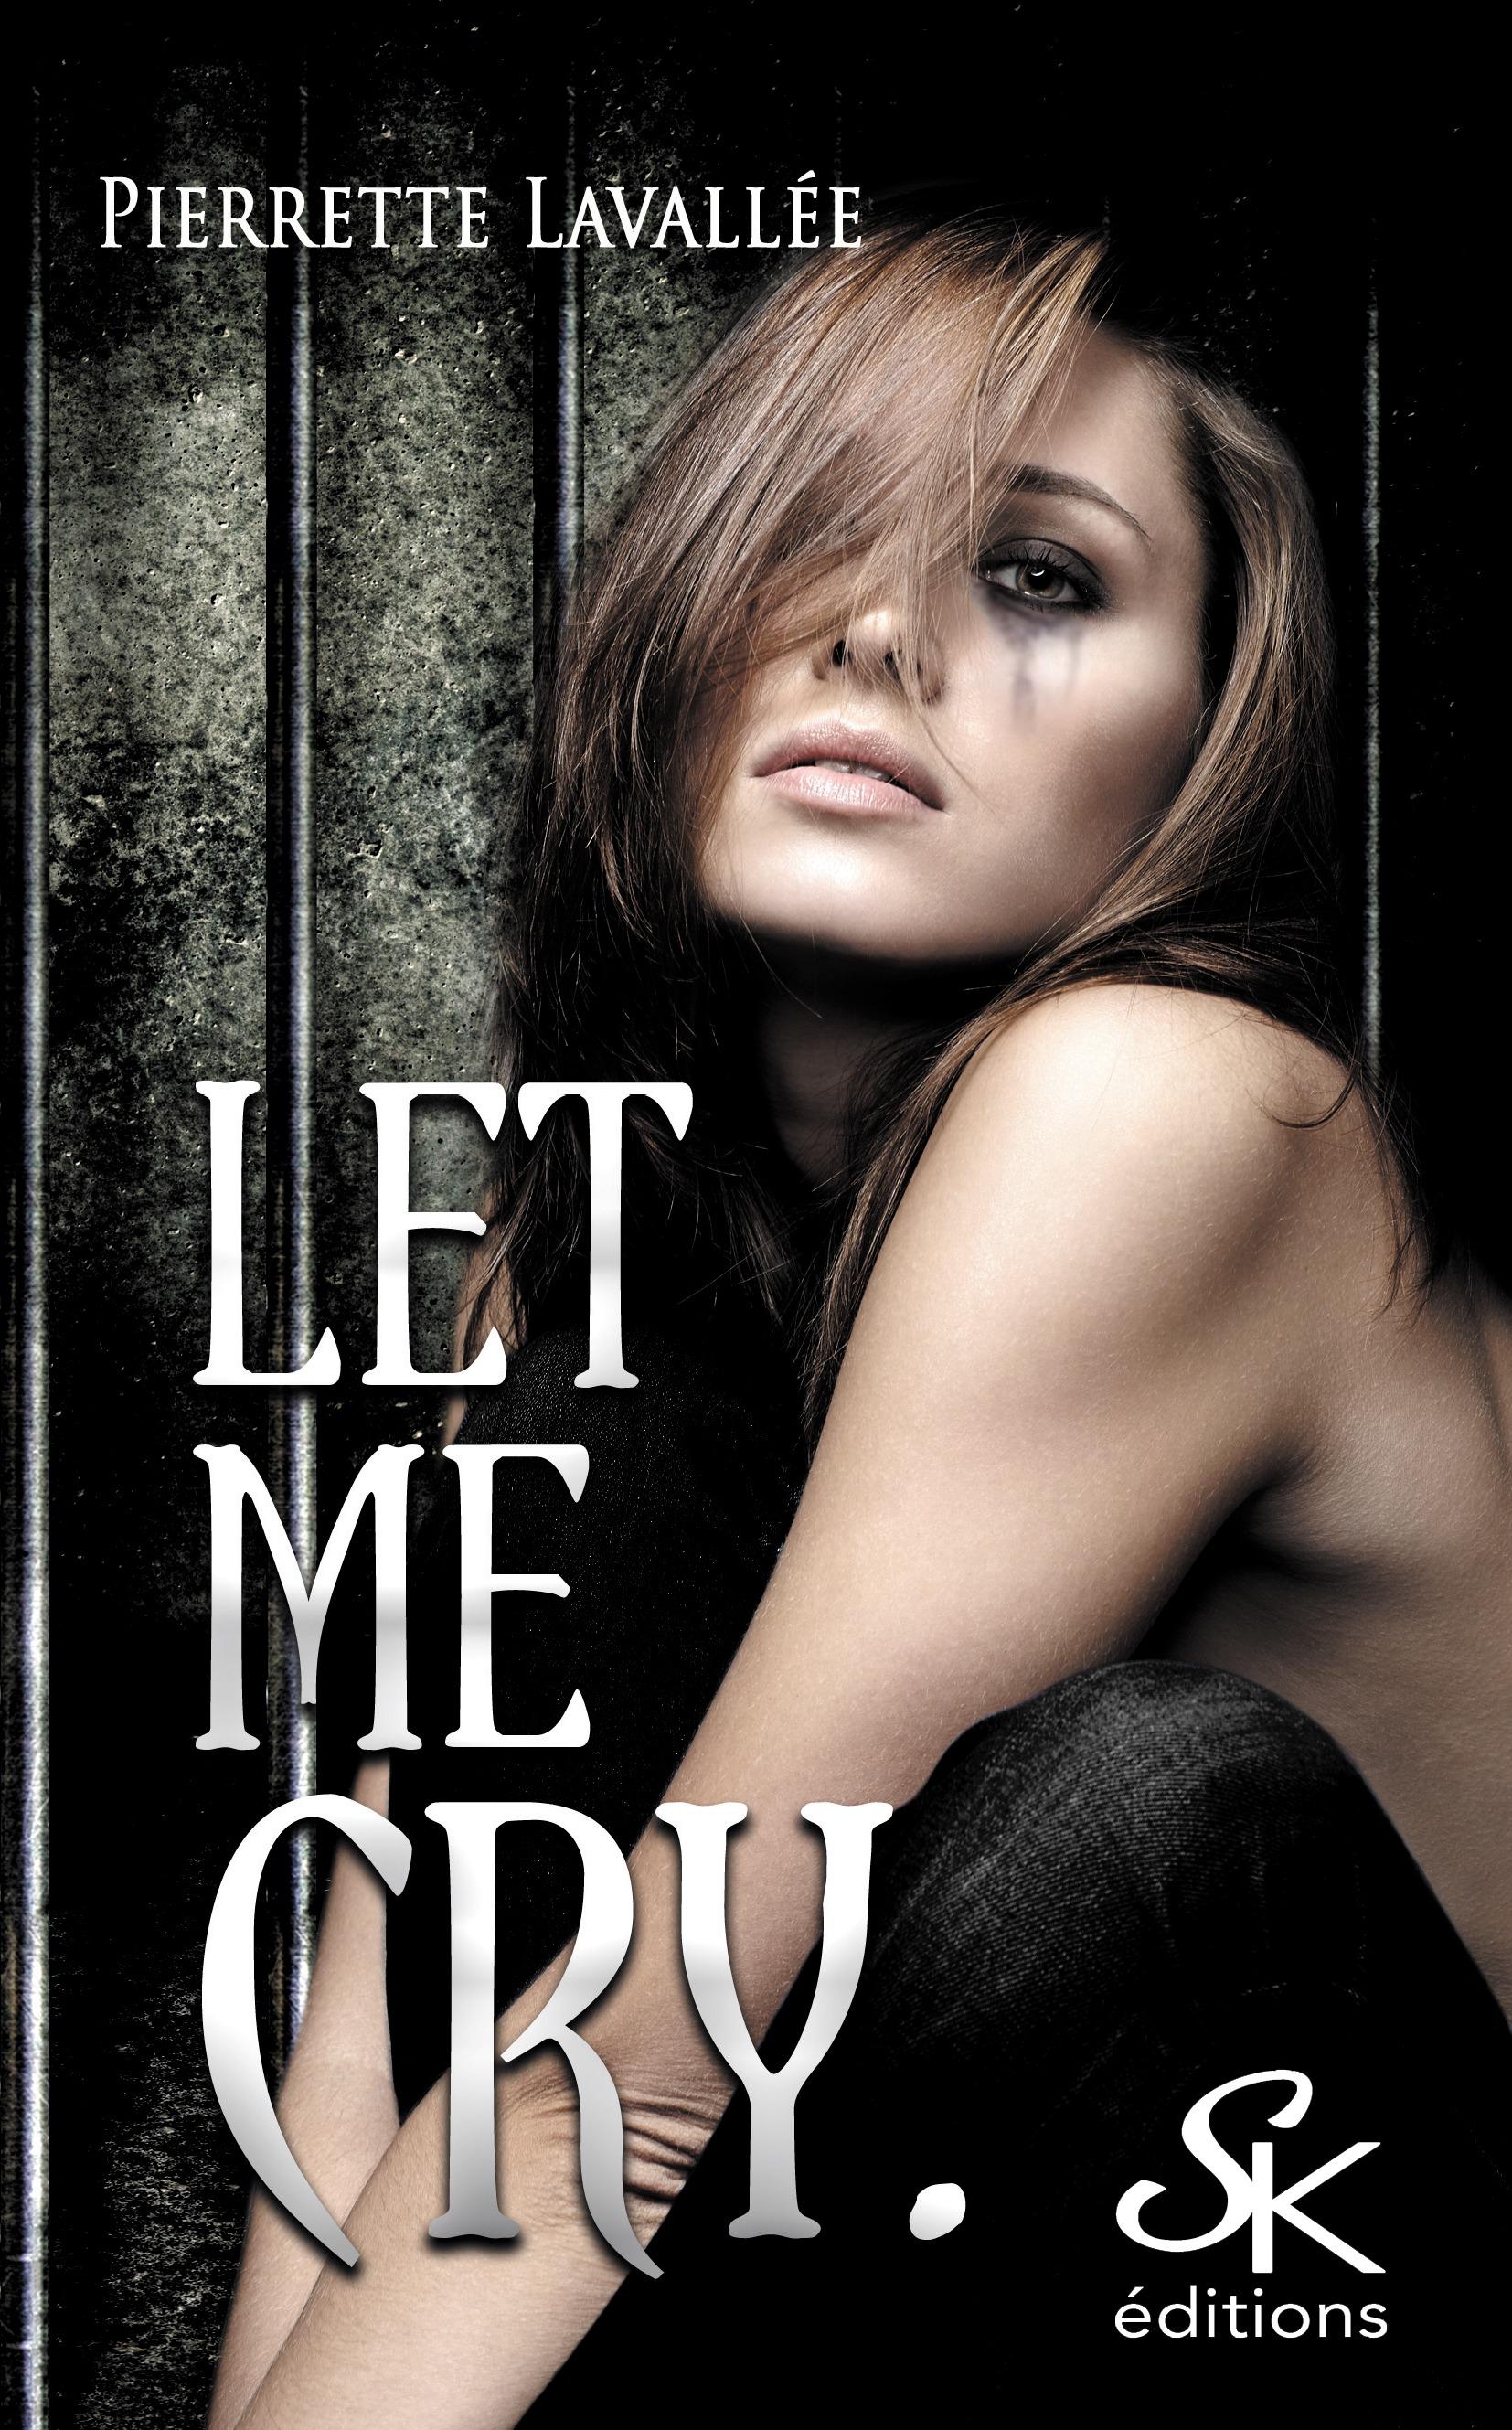 Let me cry, LET ME..., T2